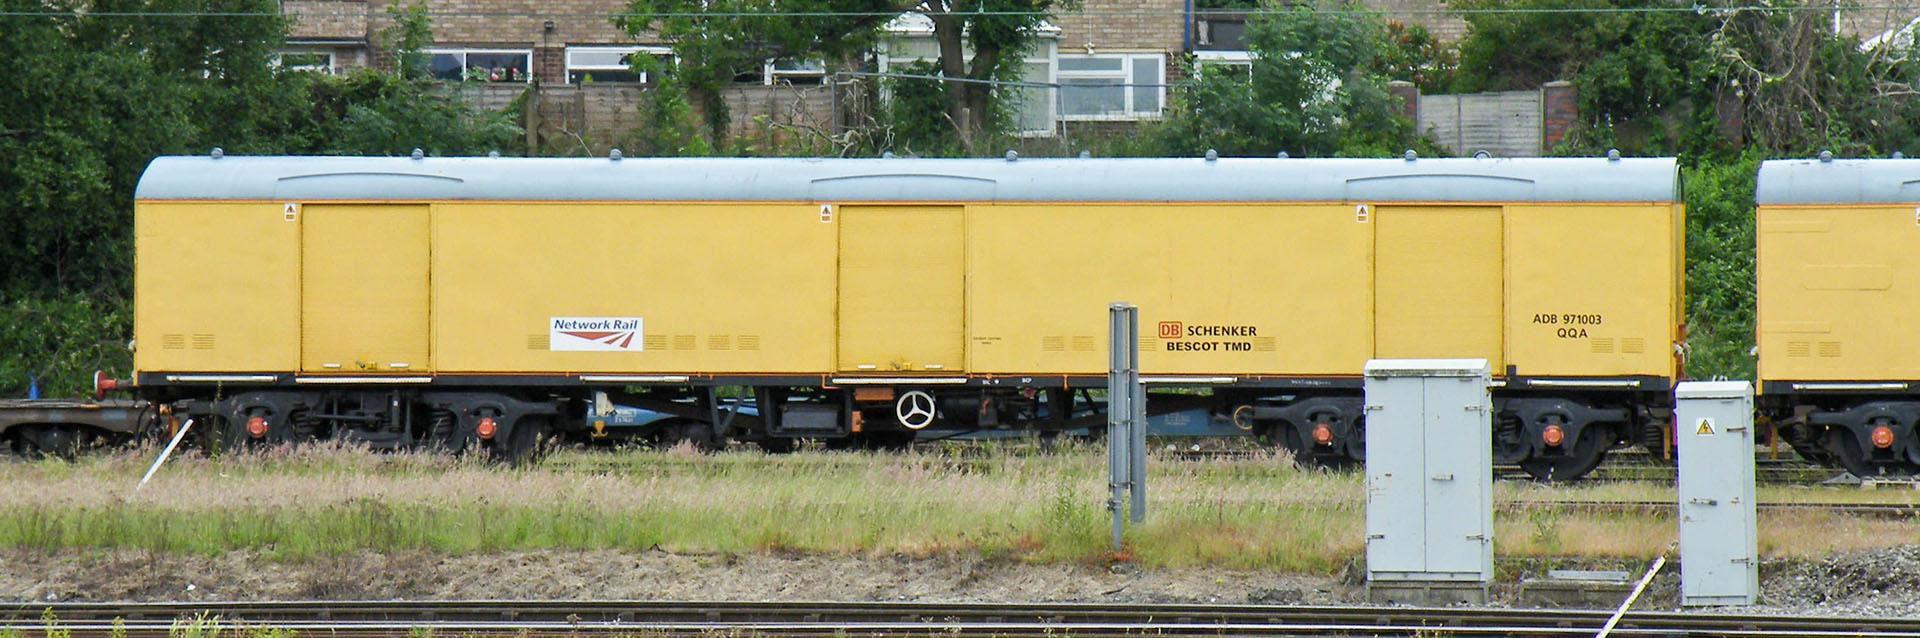 QQA Breakdown Train support coach ADB 971003 at Bescot in June 2013. © Dan Adkins